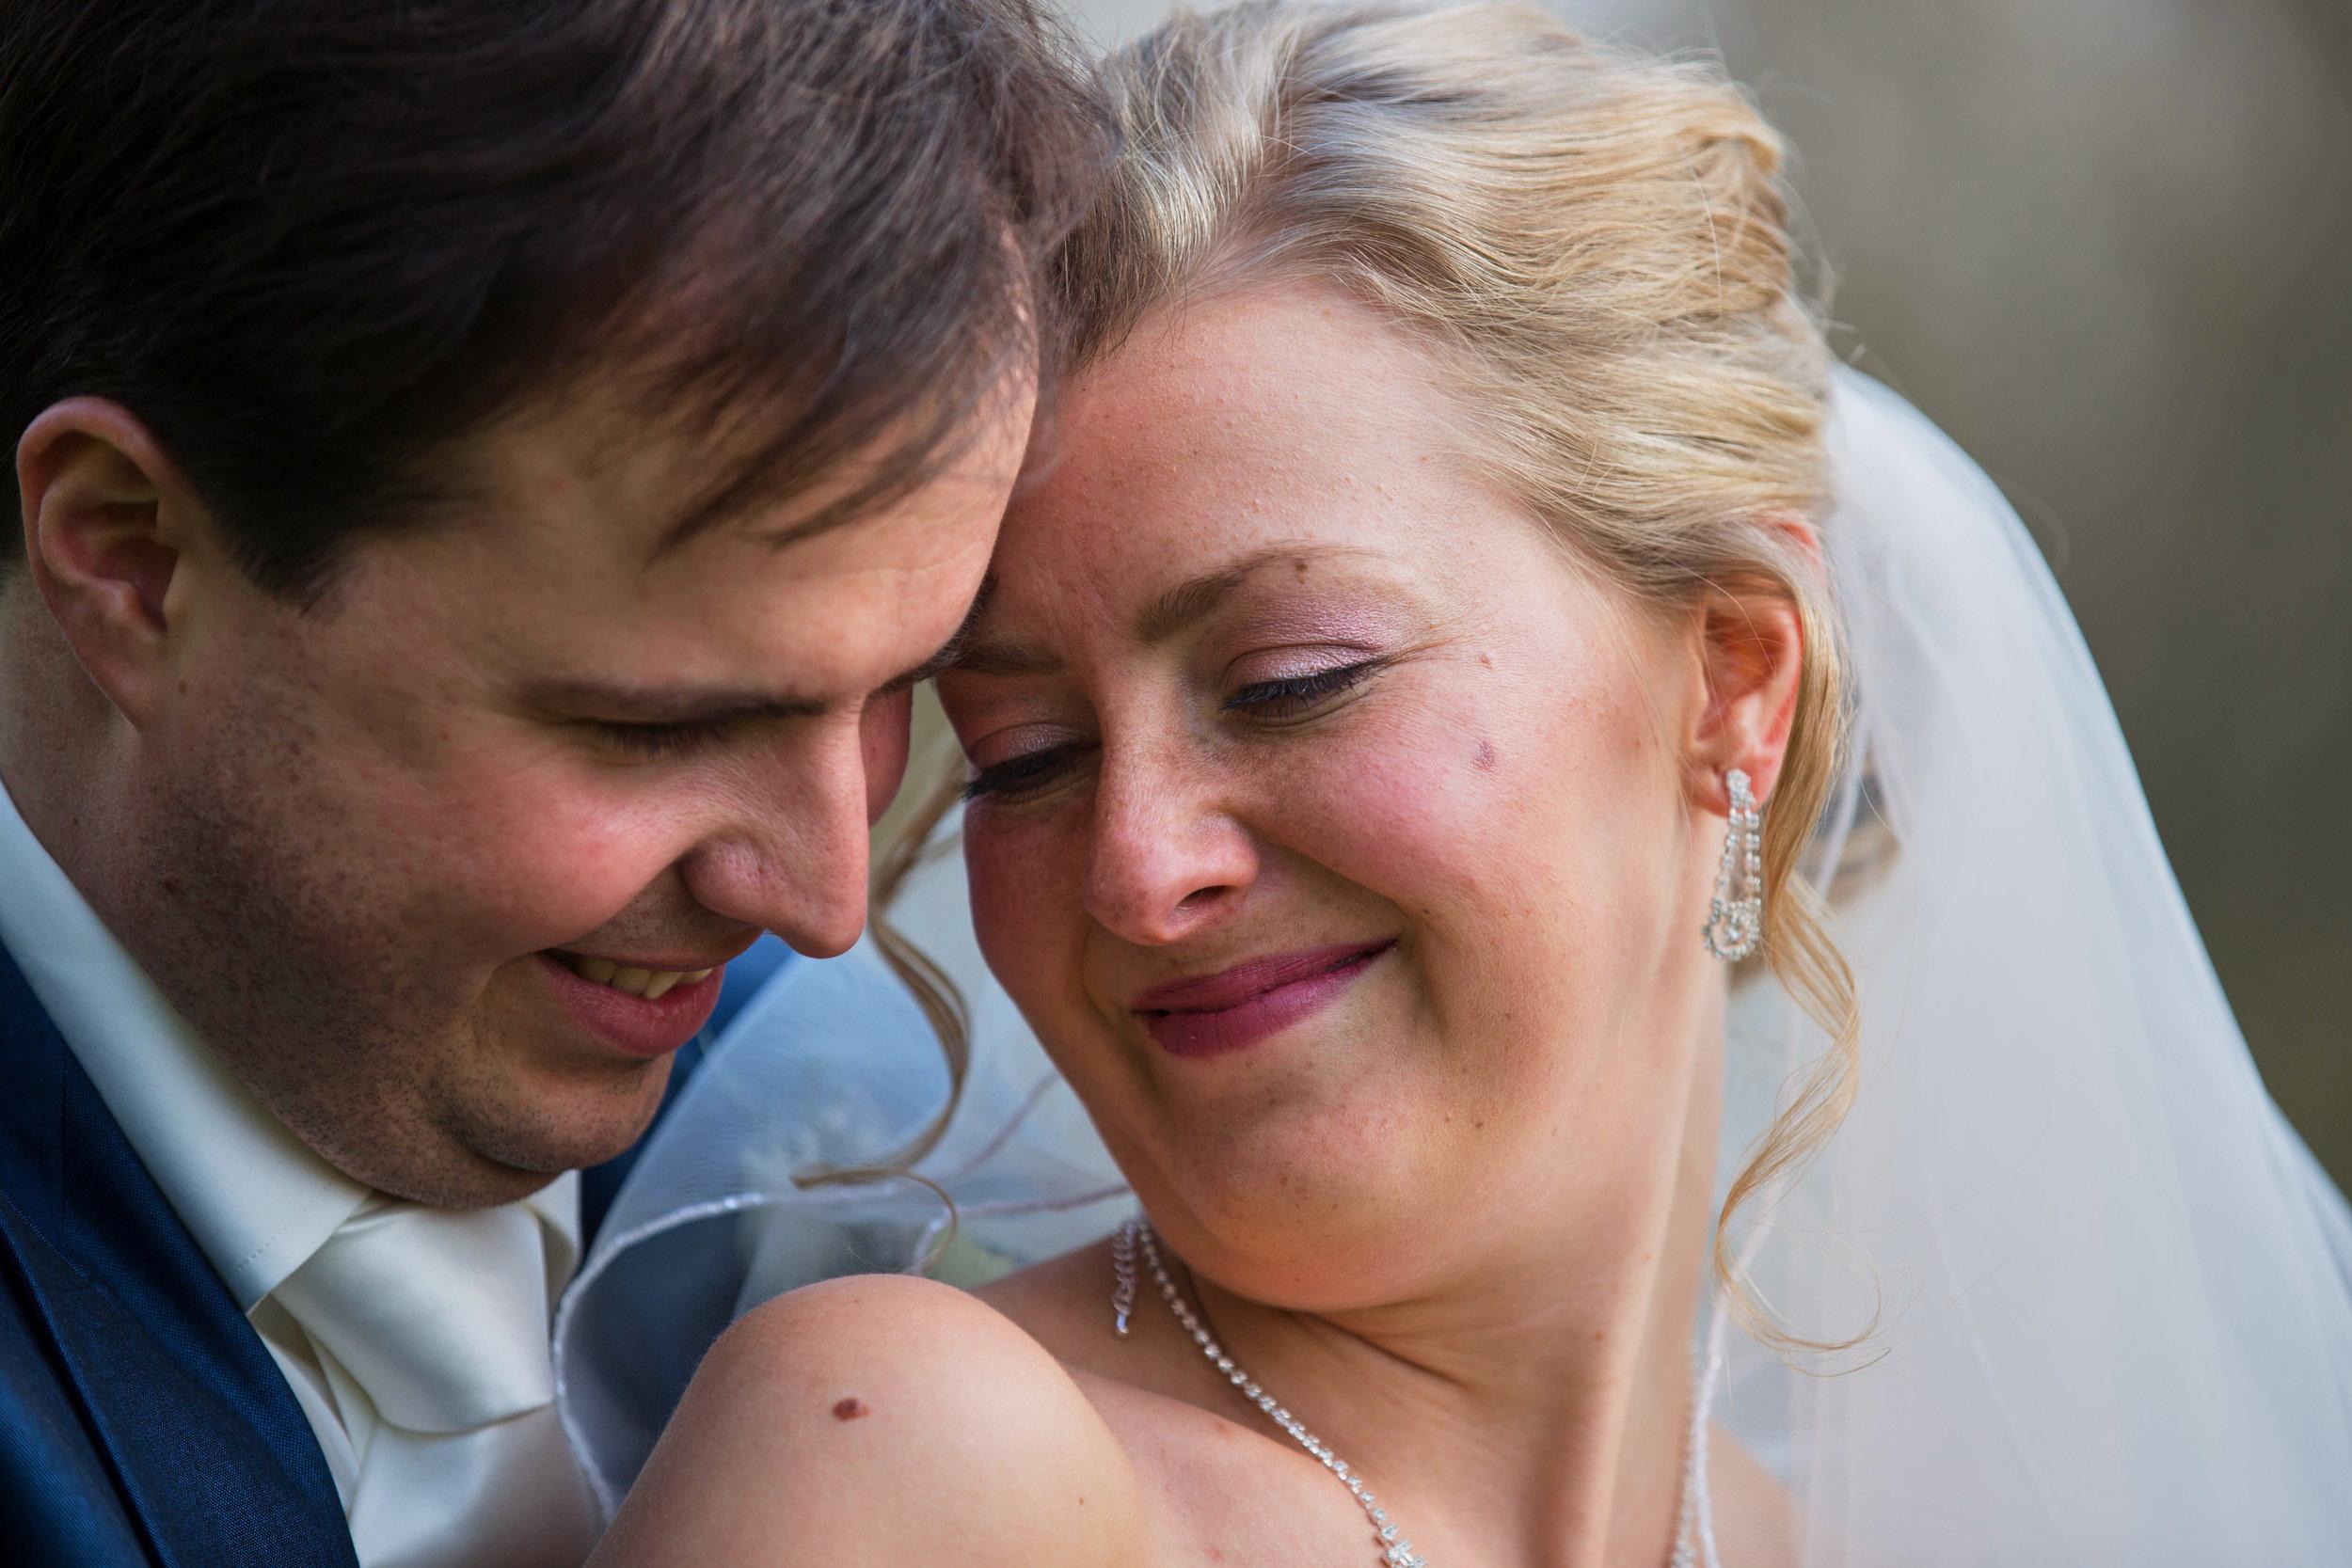 bruidsfotografie-trouwreprotage-huwelijksfotografie-bruidsfotograaf-feestfotografie-Danielle-Benjamin-07.jpg